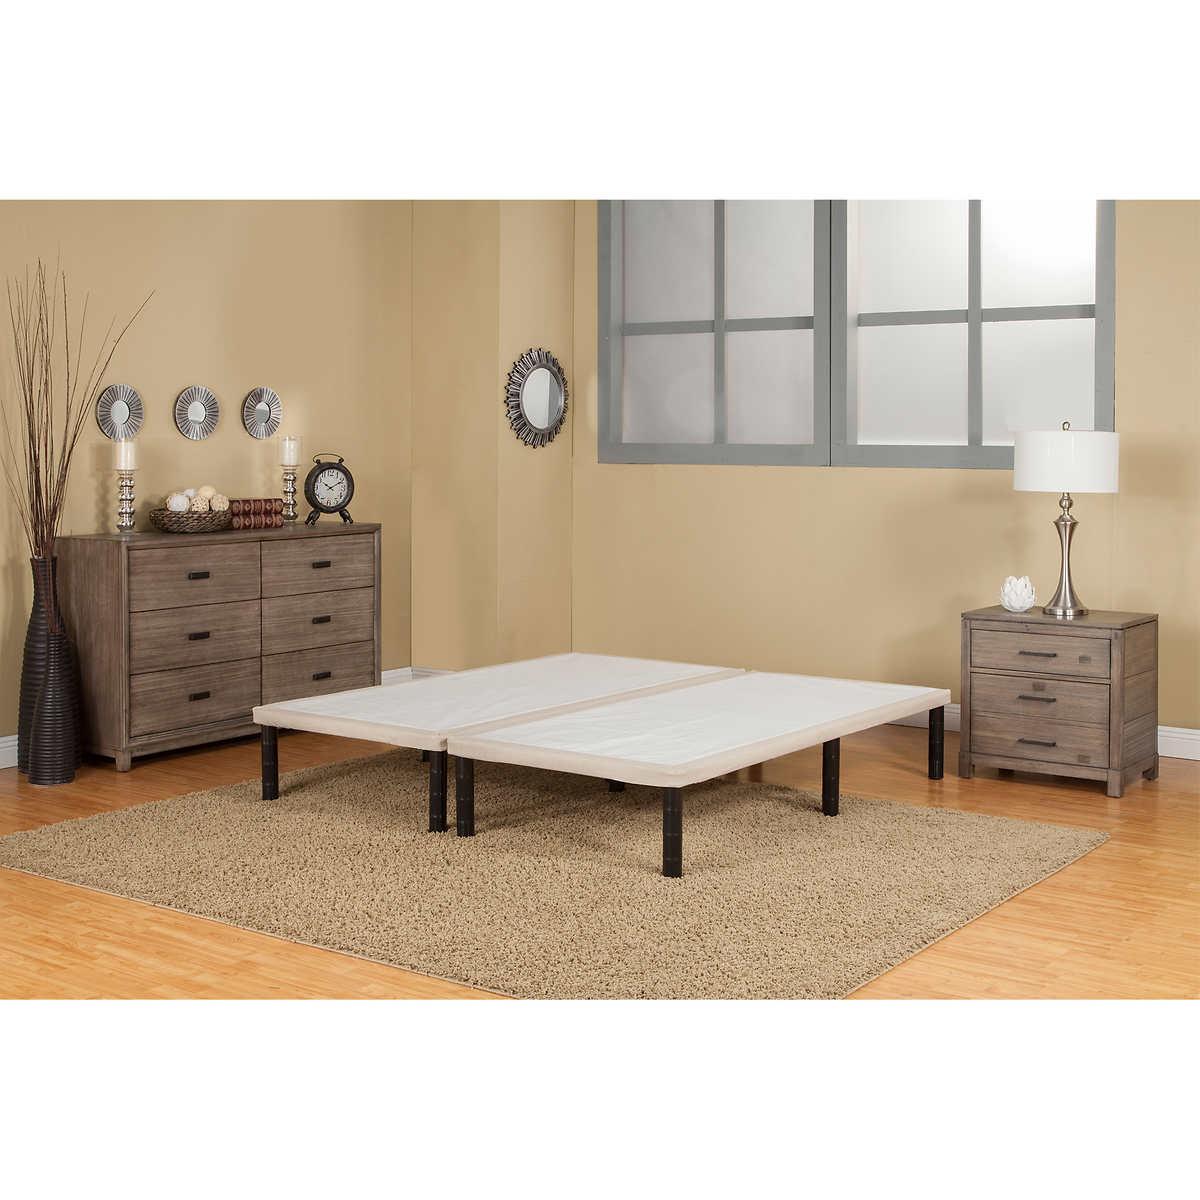 sleep science split folding king mattress foundation - King Bed Frame Costco